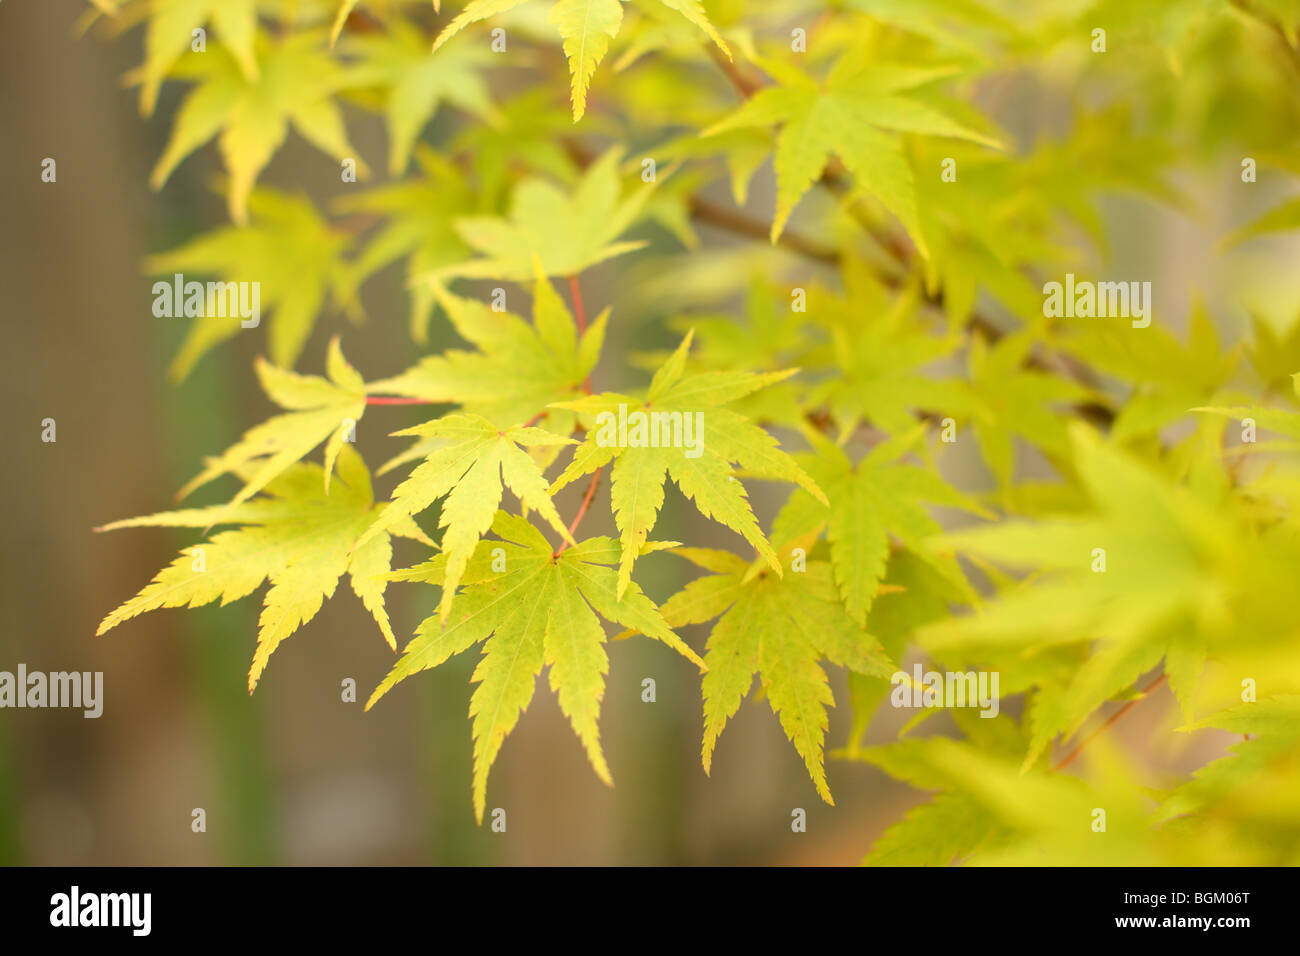 Hojas de arce japonés amarillo Imagen De Stock